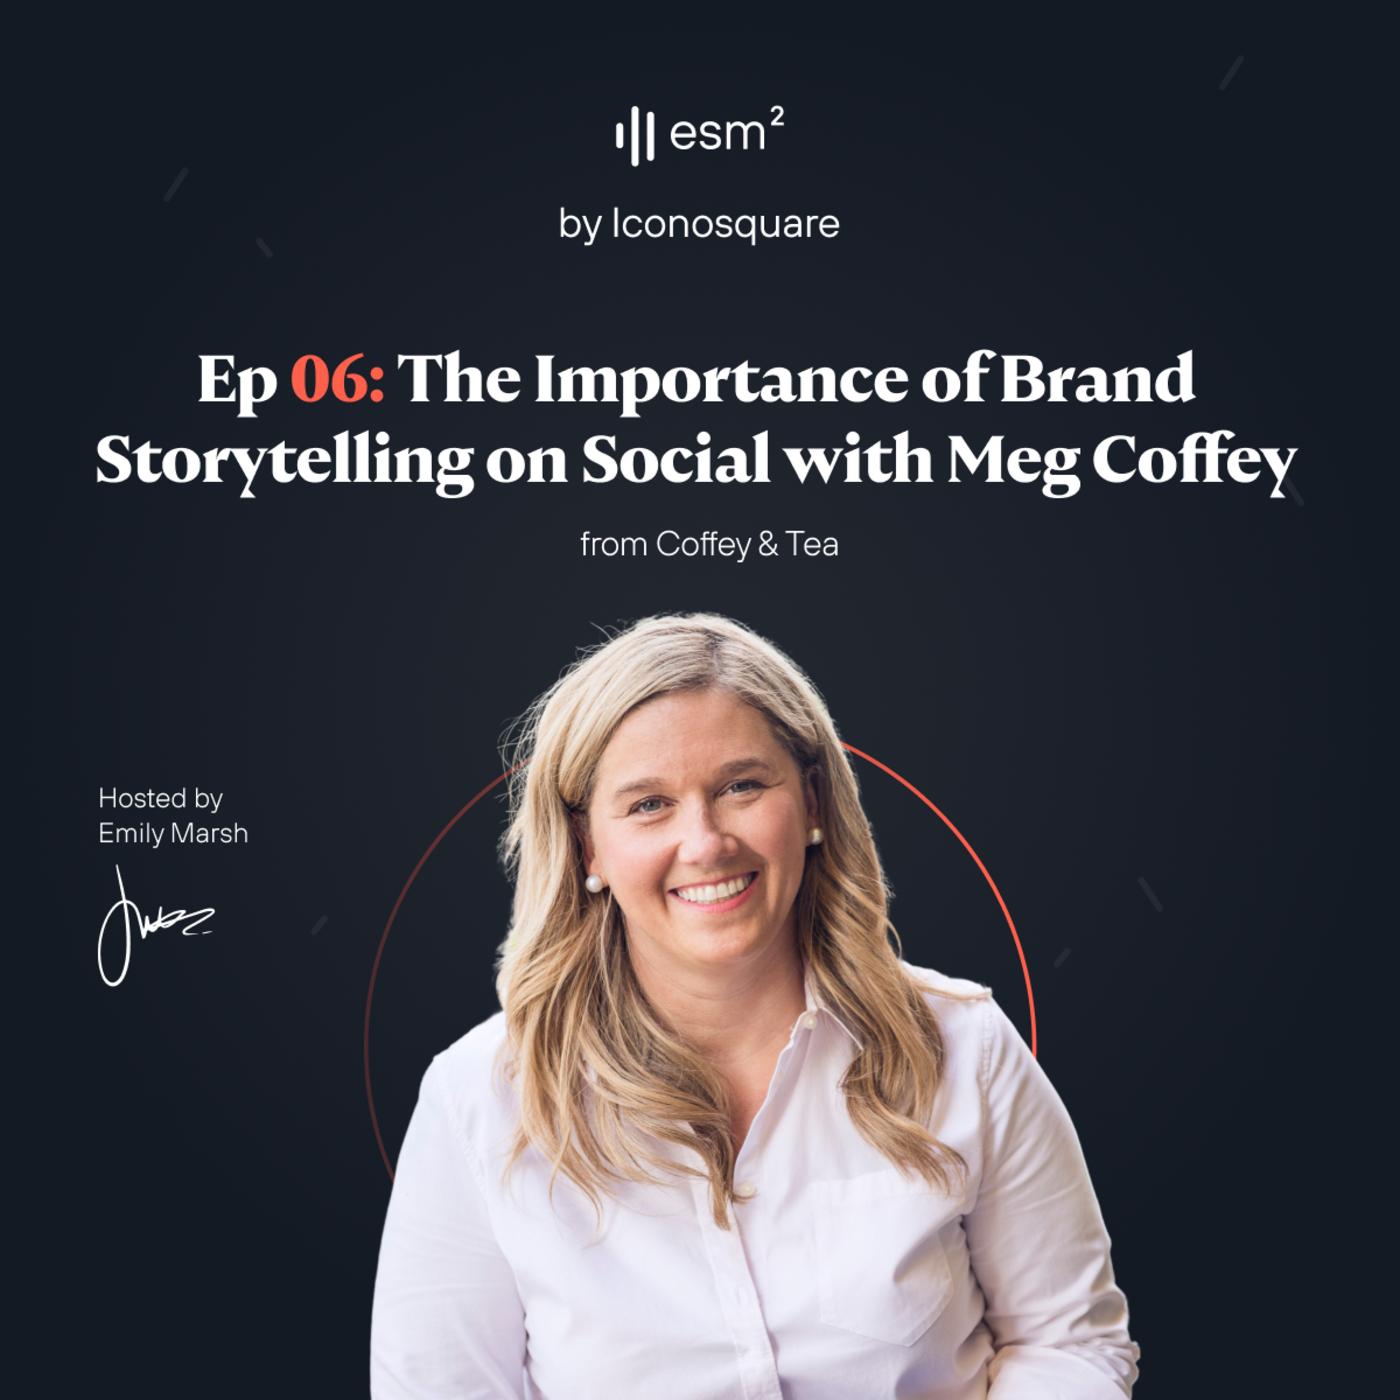 """The Importance of Brand Storytelling on Social Media"" - Meg Coffey from Coffey & Tea"